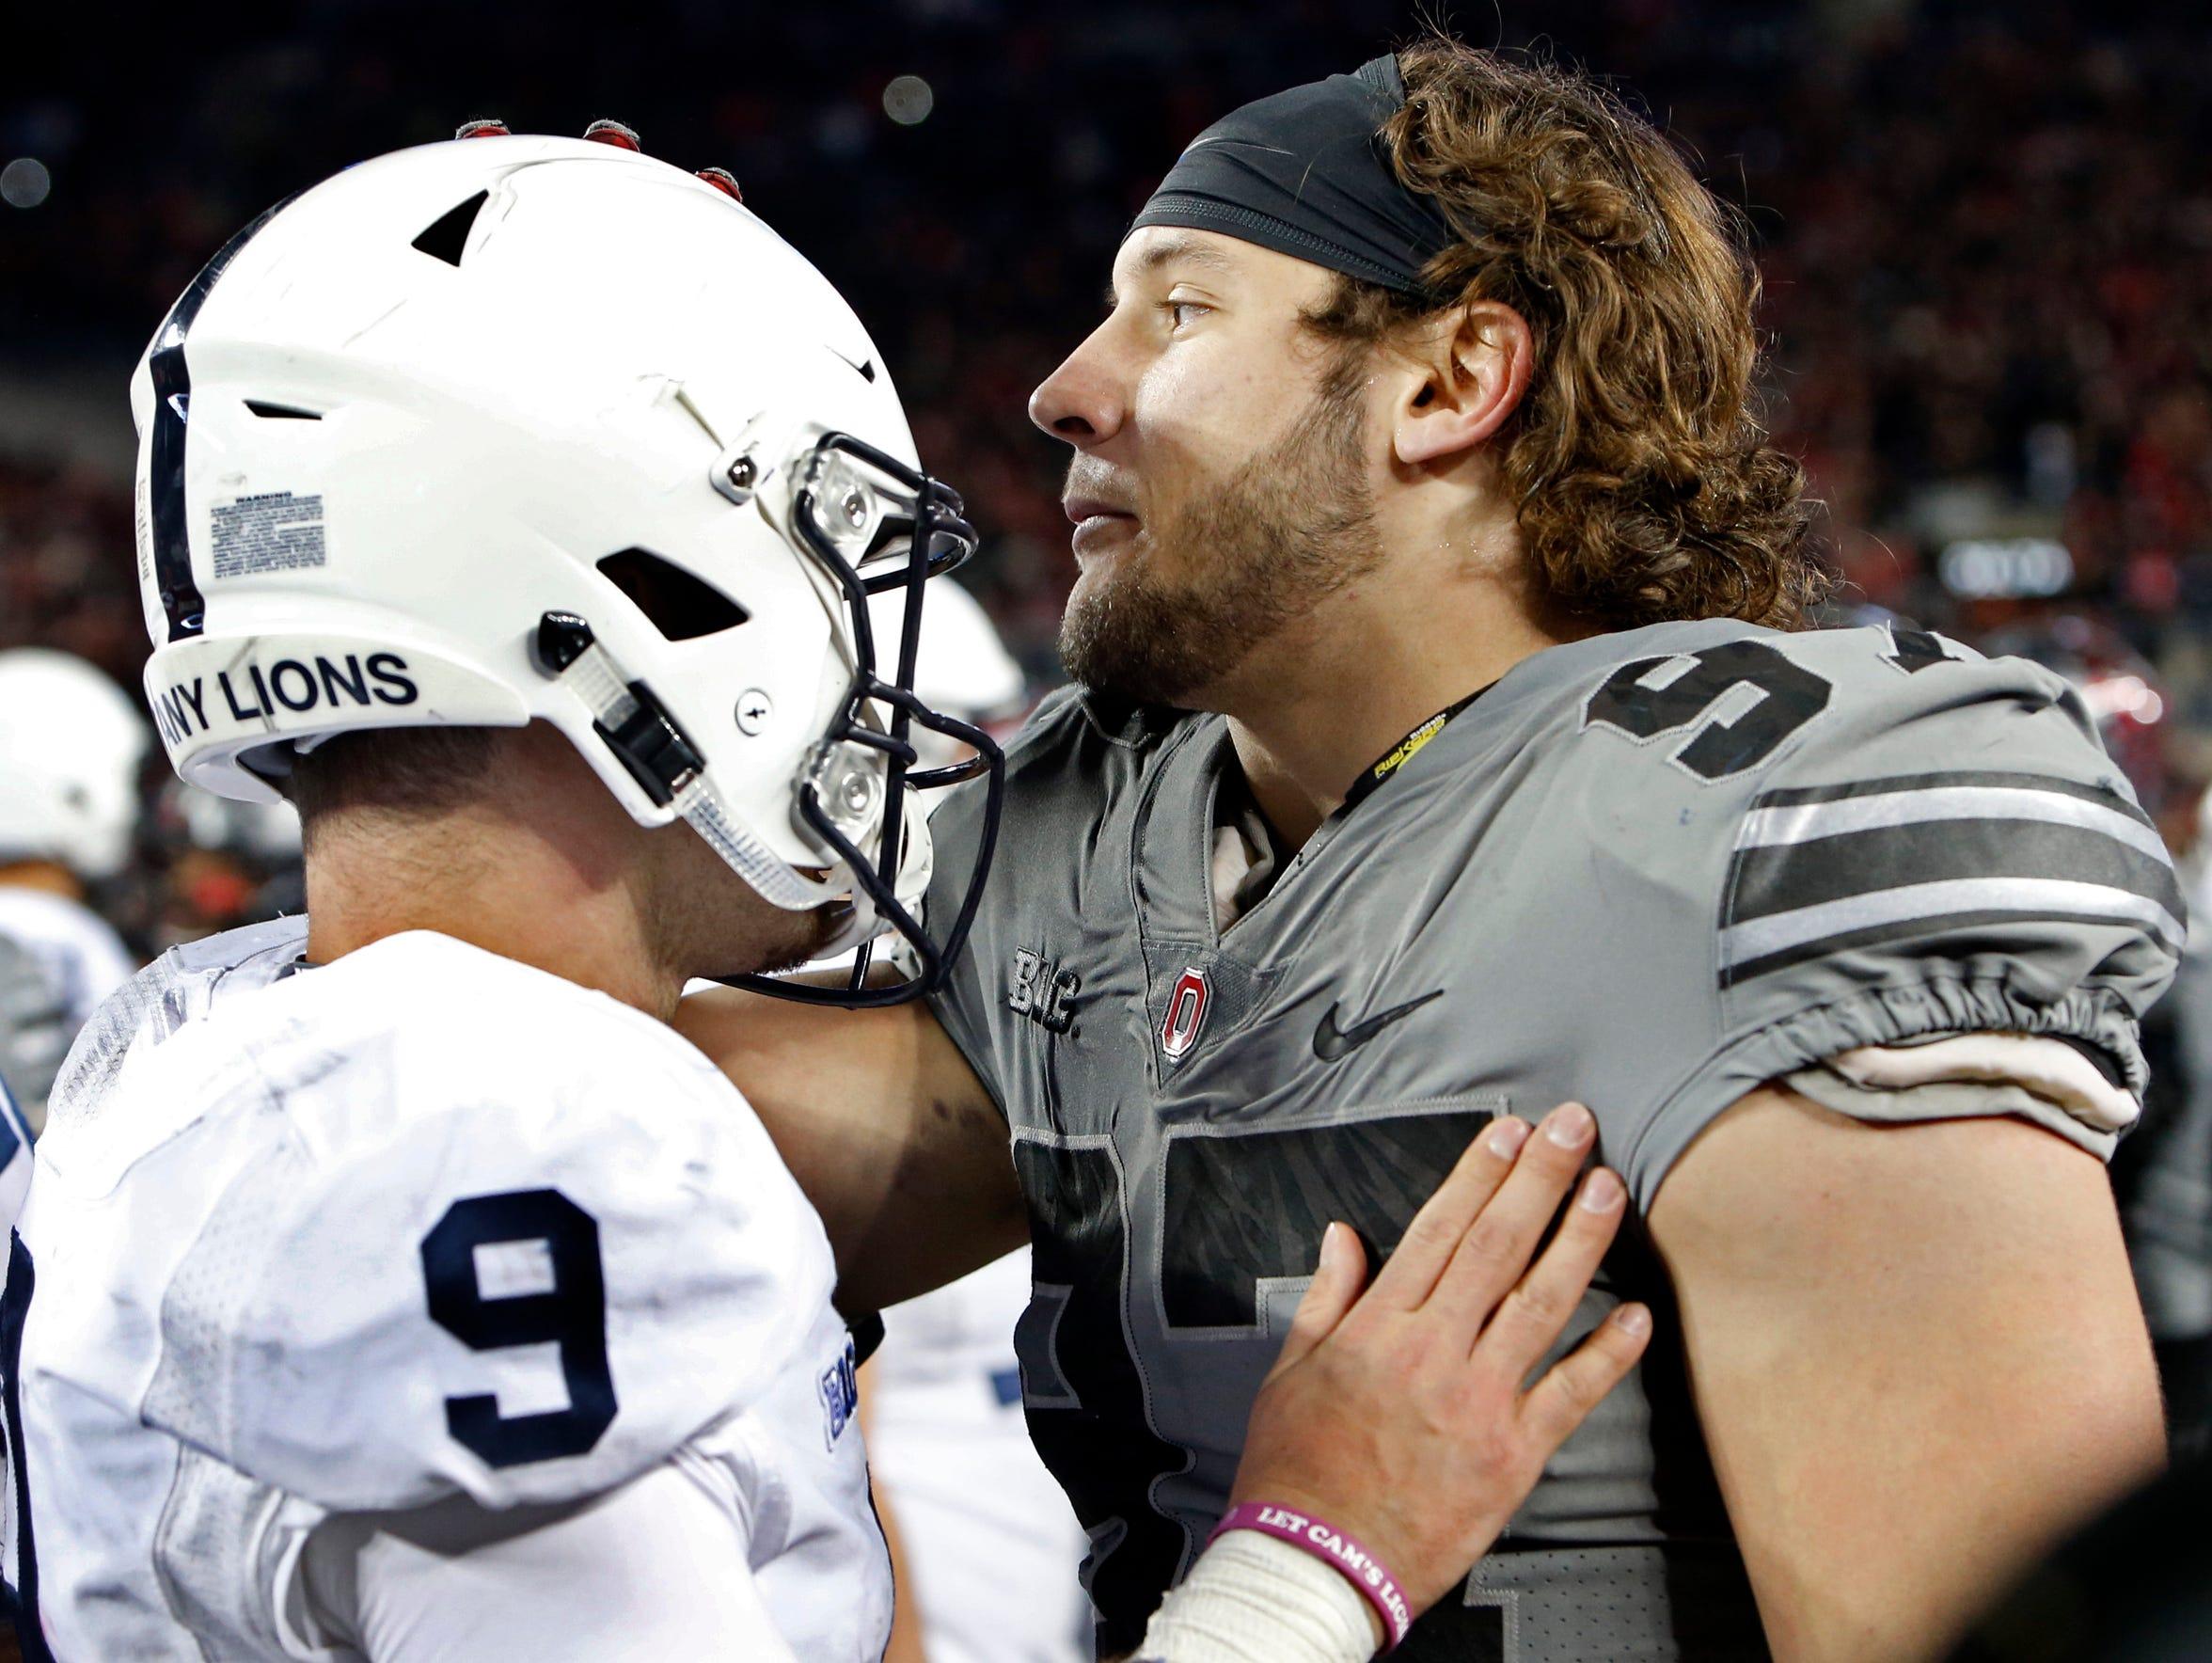 Penn State quarterback Trace McSorley congratulates